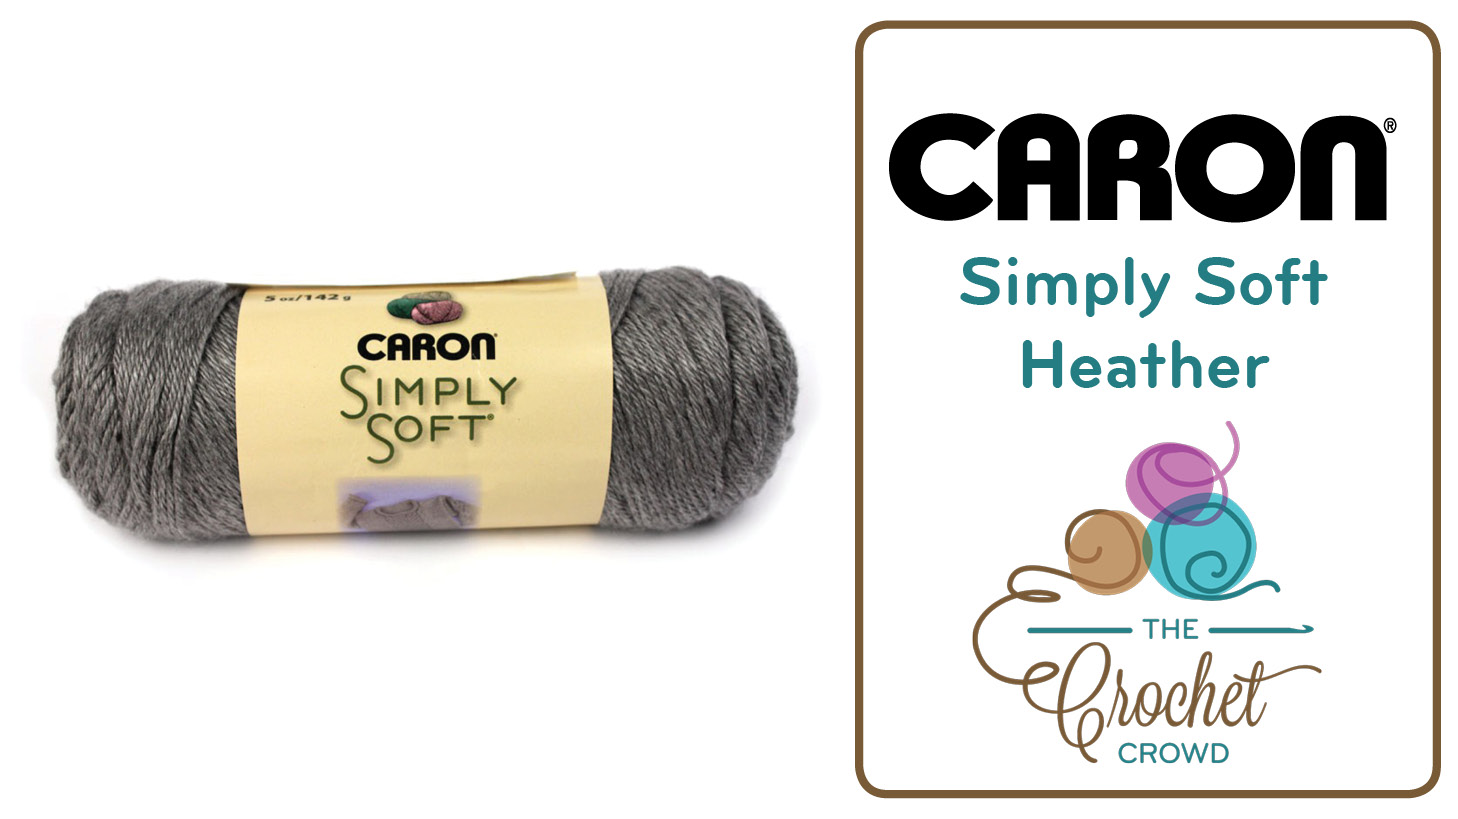 Amigurumi Caron Simply Soft : What To Do With Caron Simply Soft Heathers Yarn - The ...